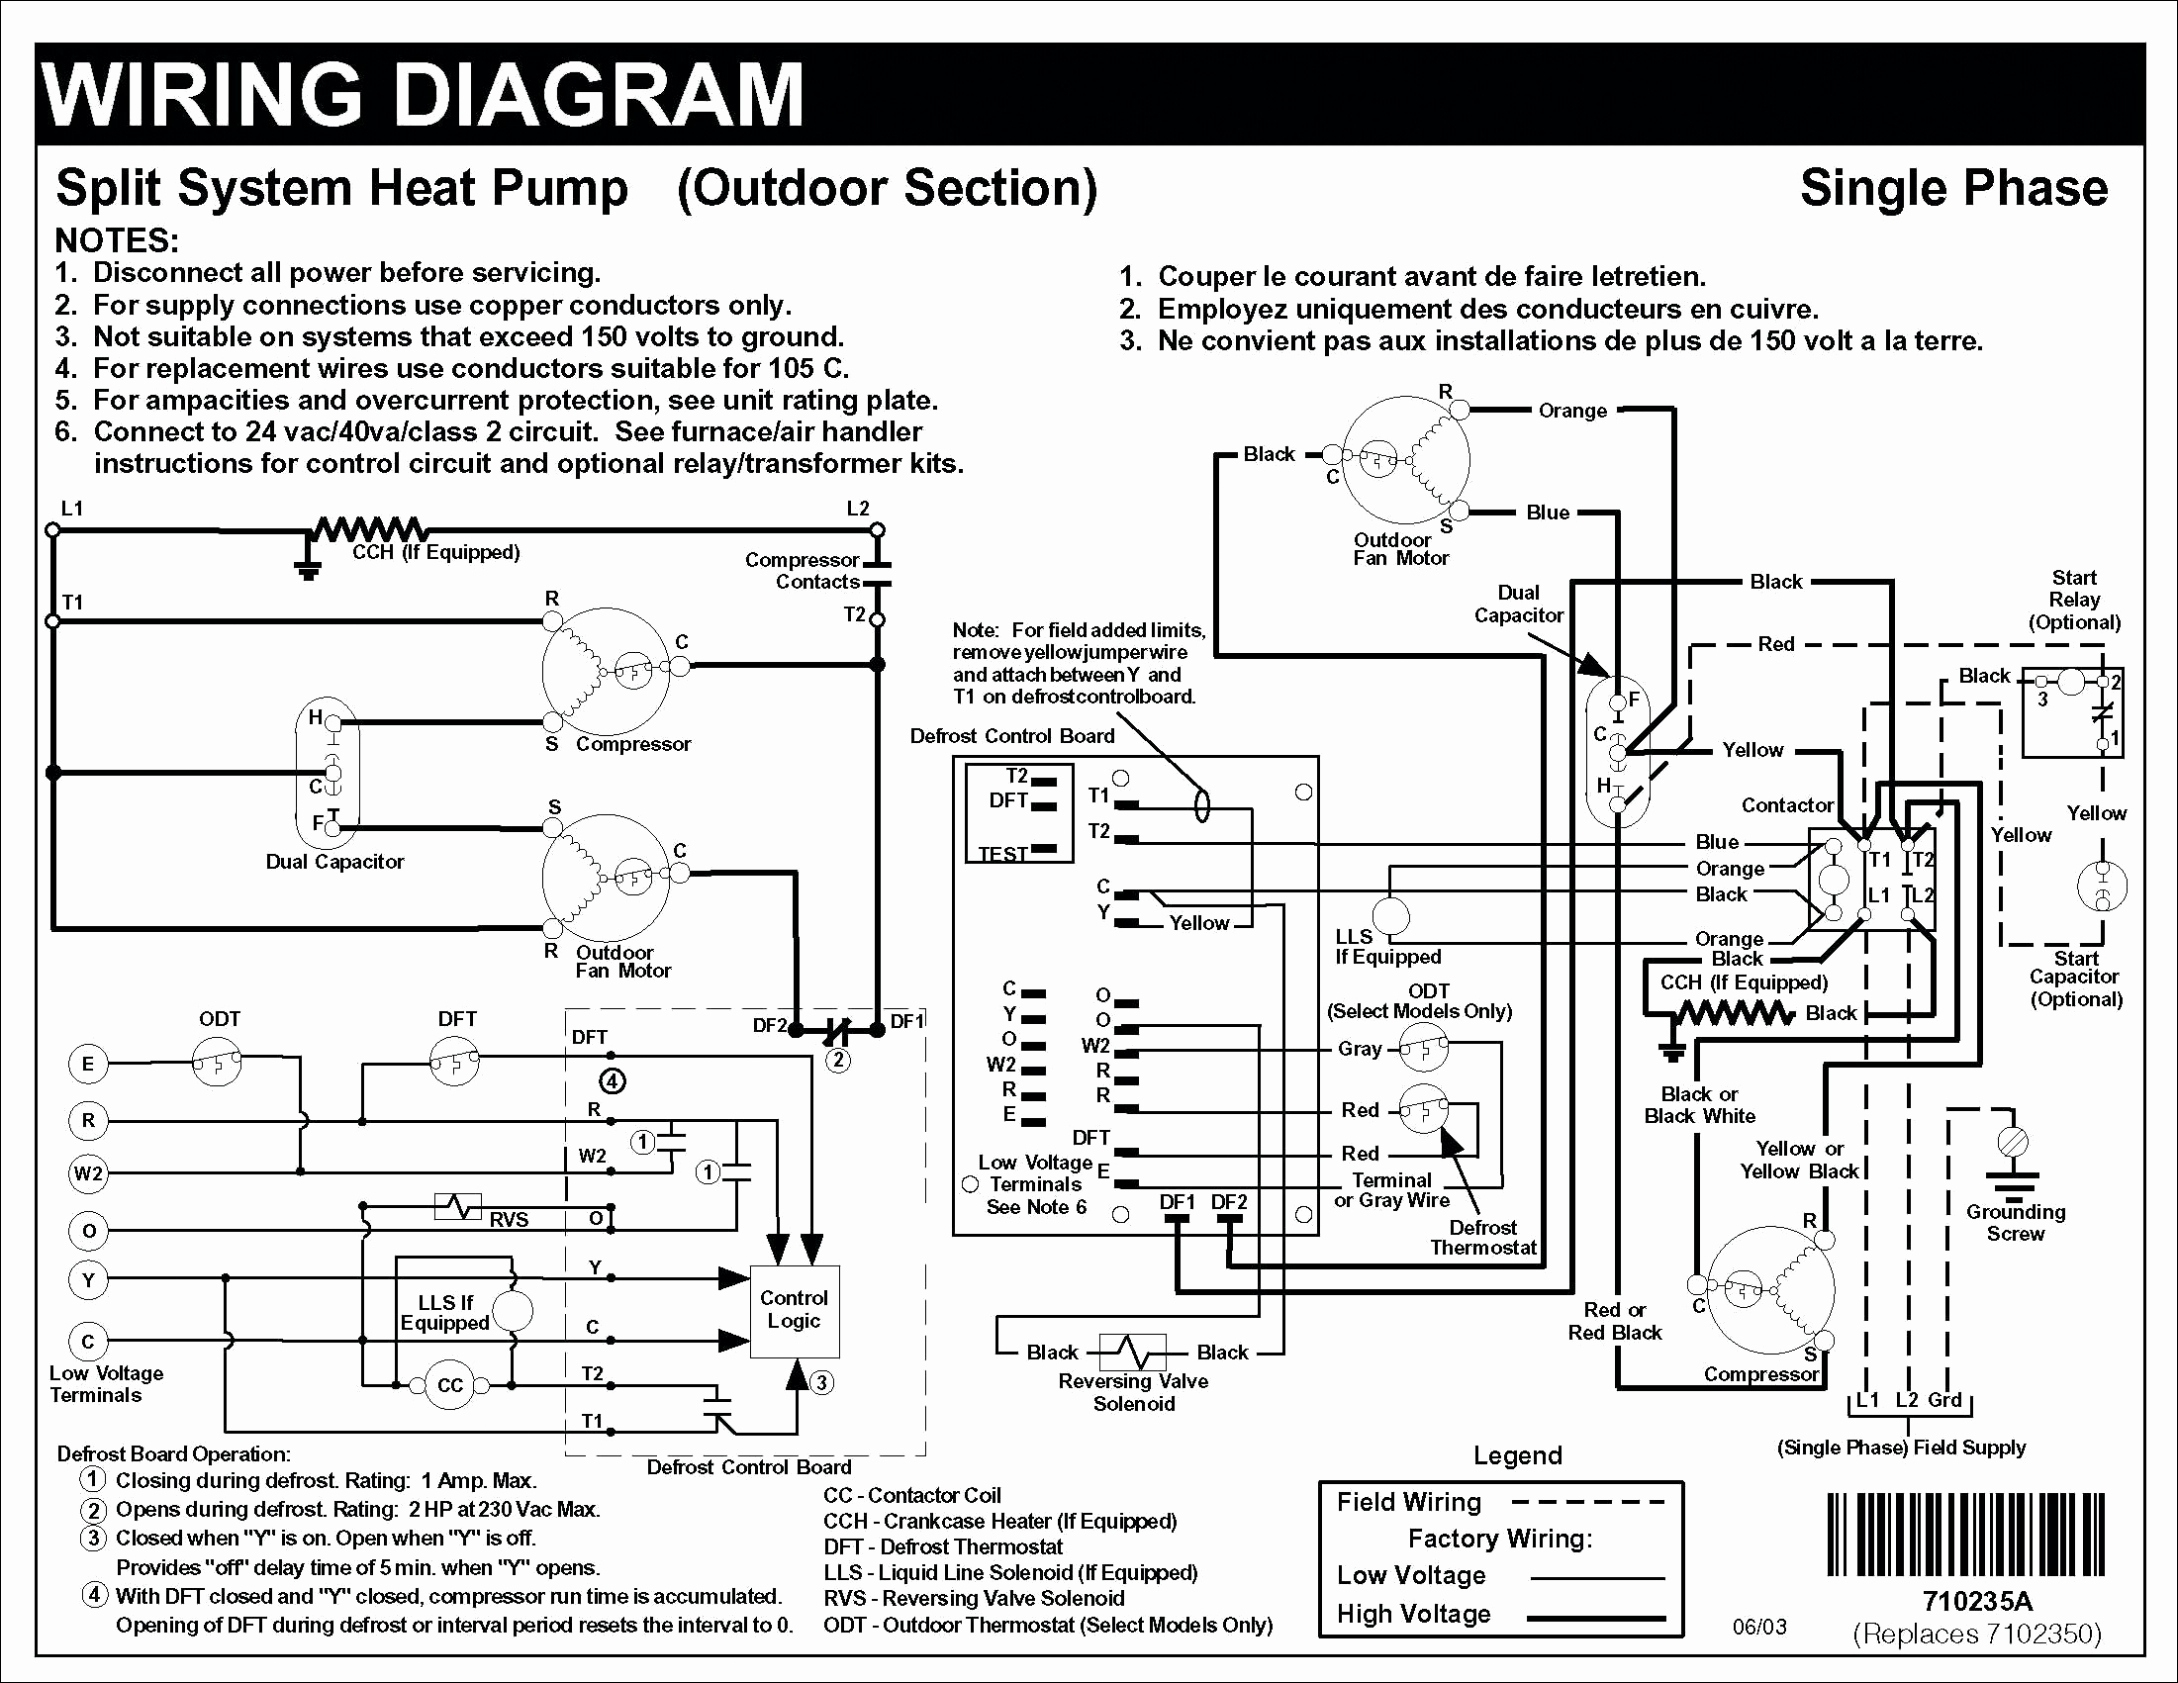 Pioneer Fh X700Bt Wiring Diagram   Wiring Diagram - Pioneer Fh X720Bt Wiring Diagram